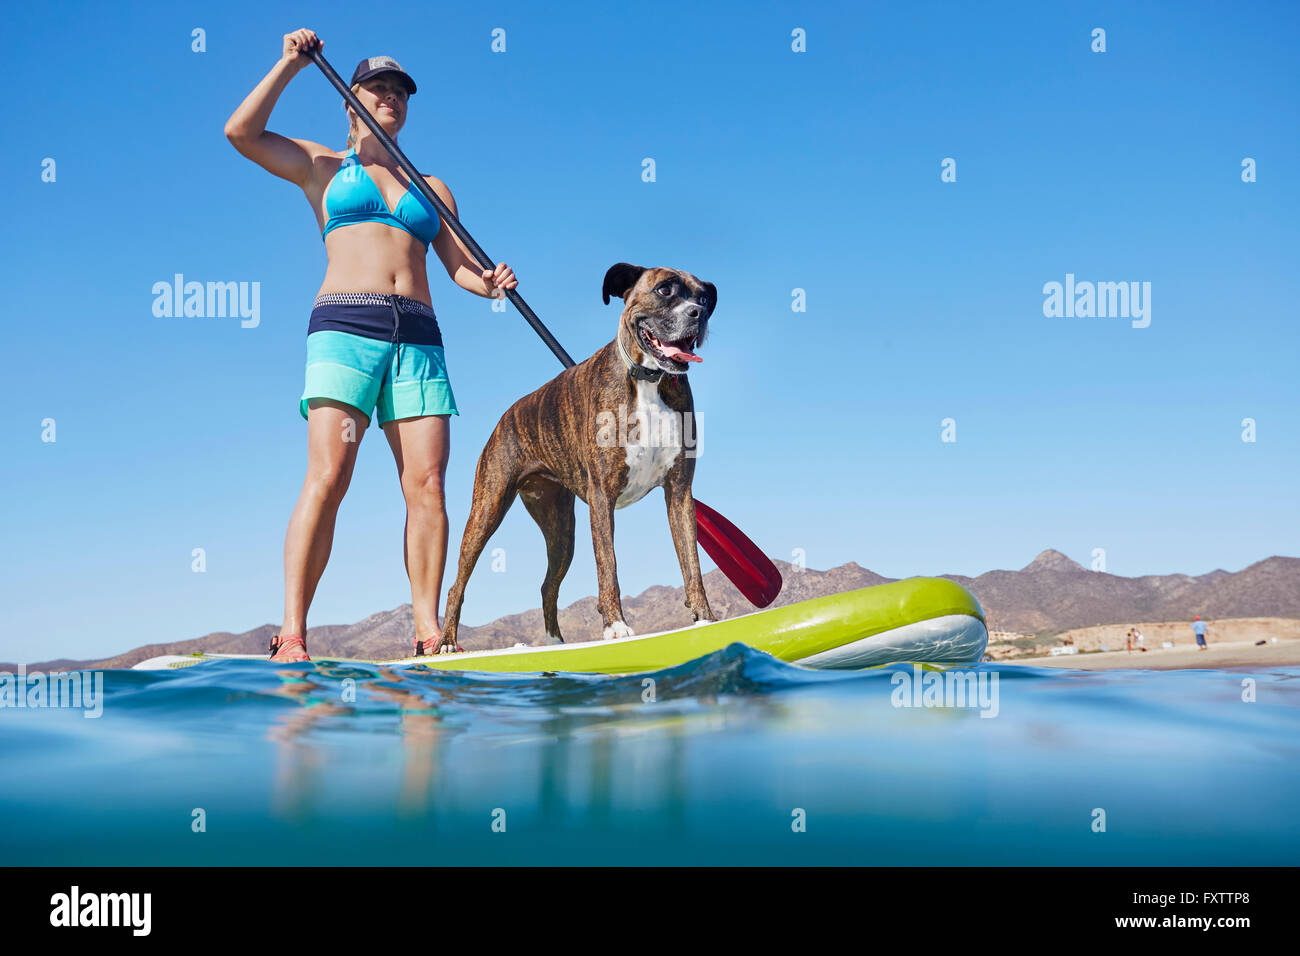 Mujer paddle surf con perro Imagen De Stock